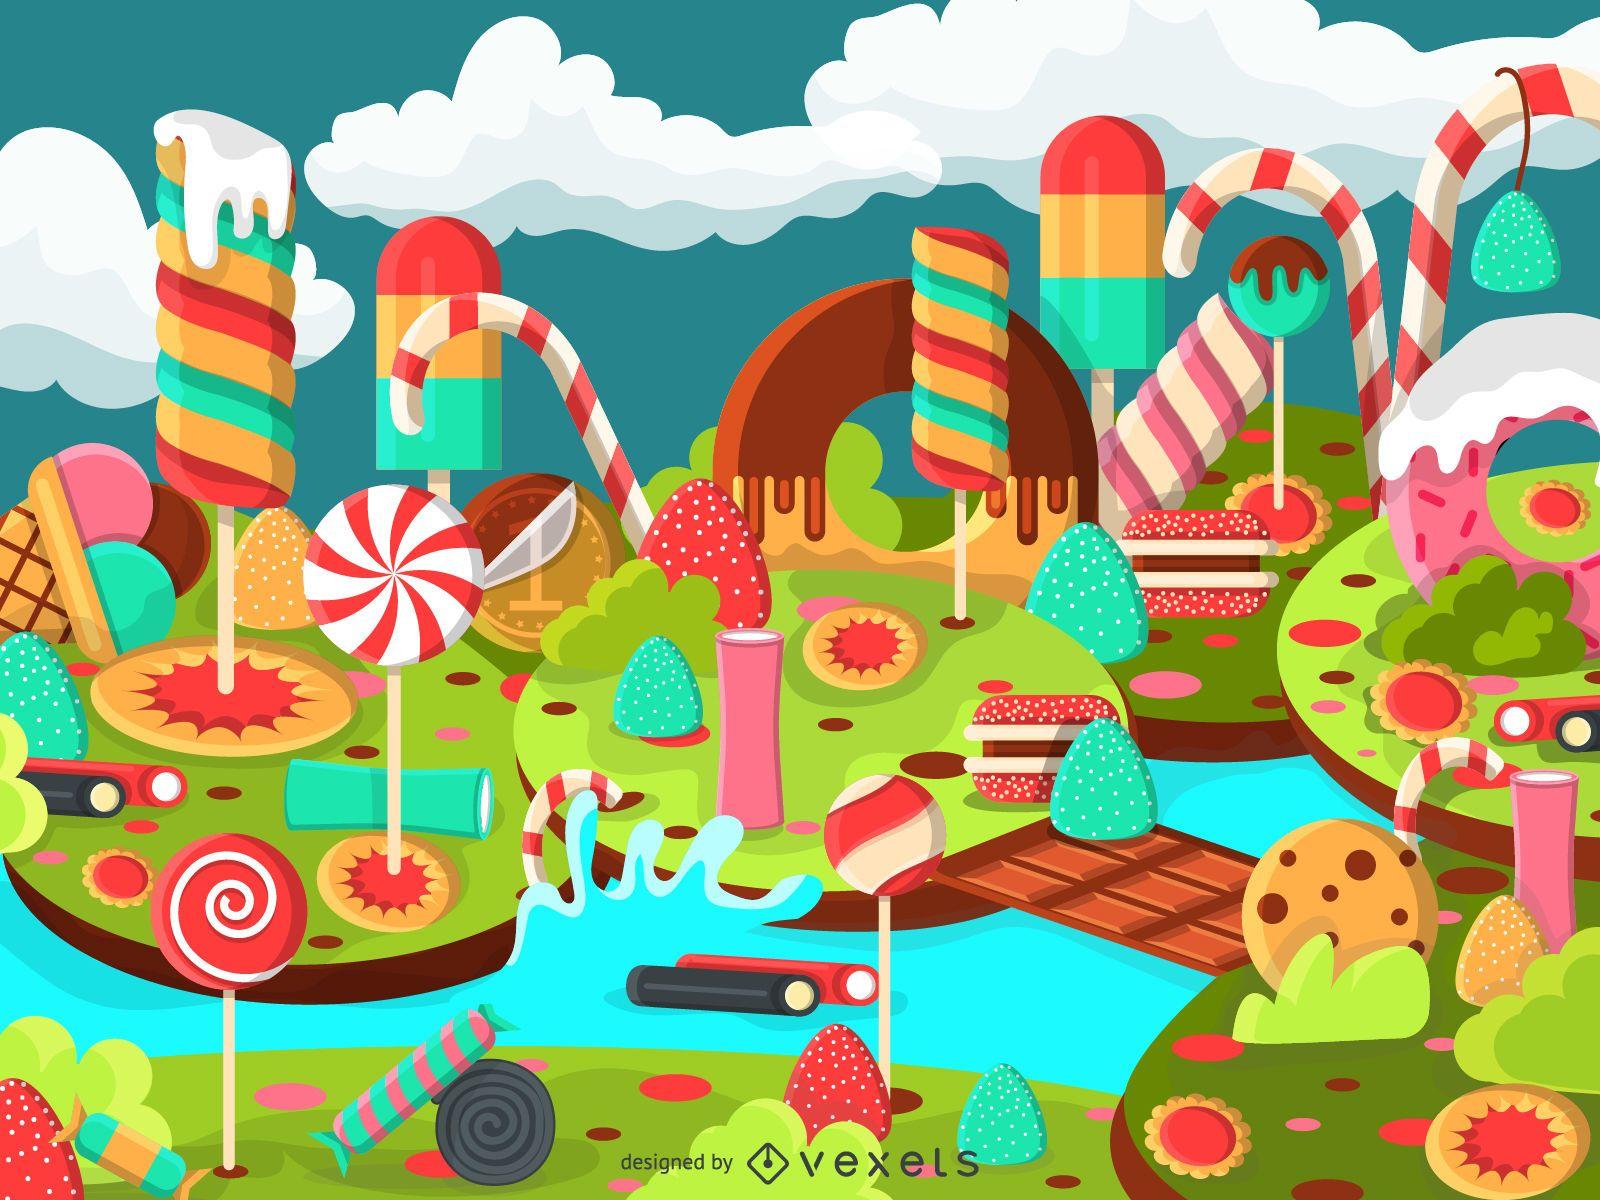 Candy landscape illustration